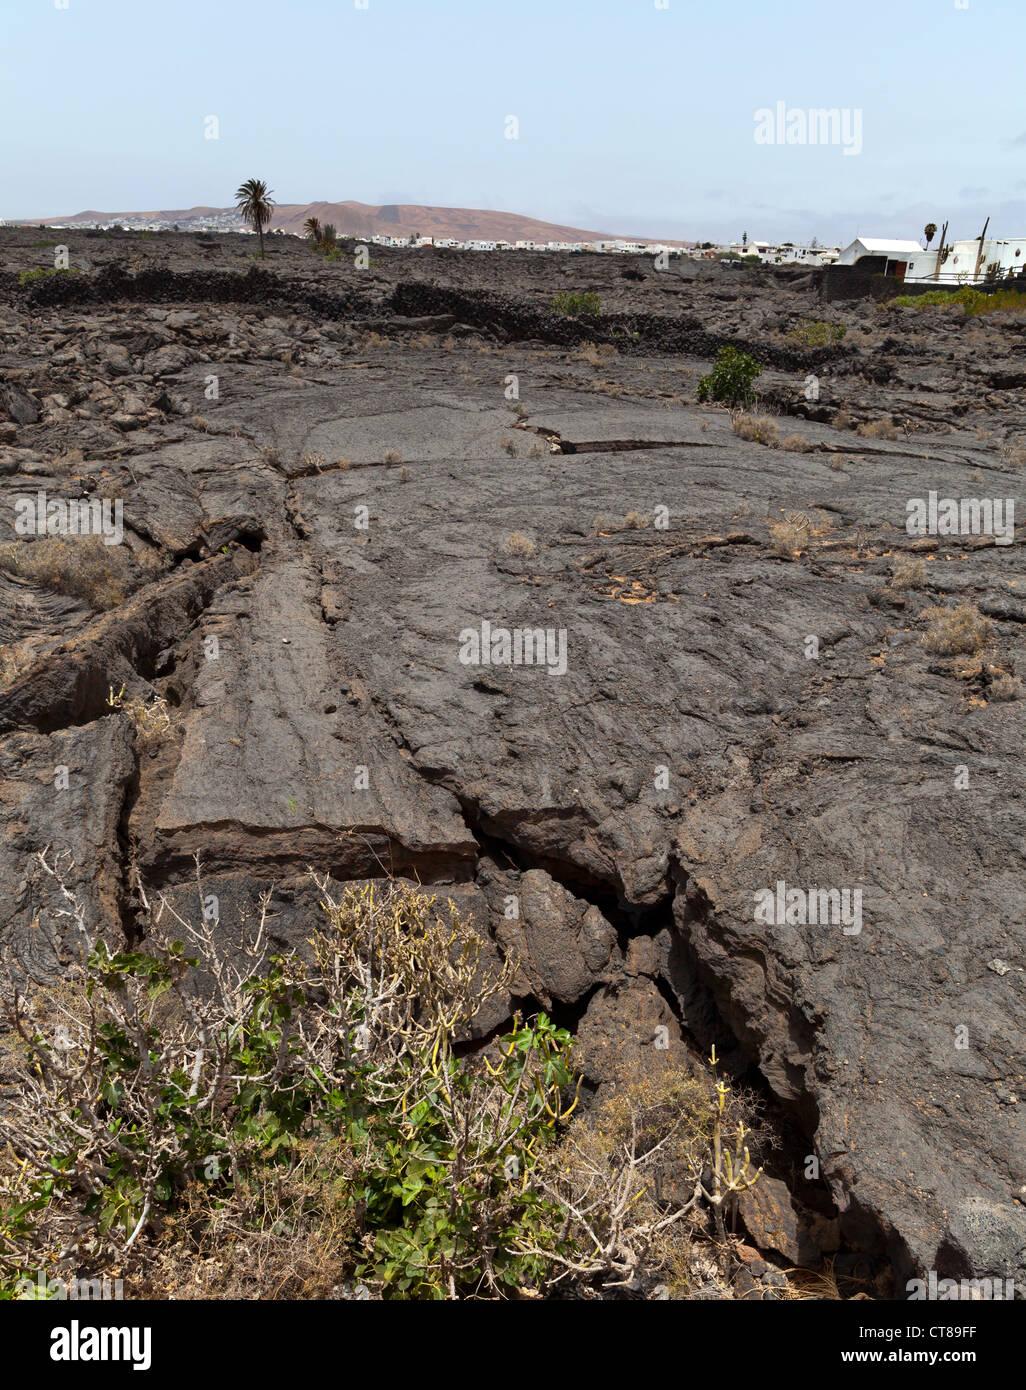 Lanzarote, Lava fields at the Fundacion Cesar Manrique - Lanzarote, Canary Islands, Spain, Europe - Stock Image